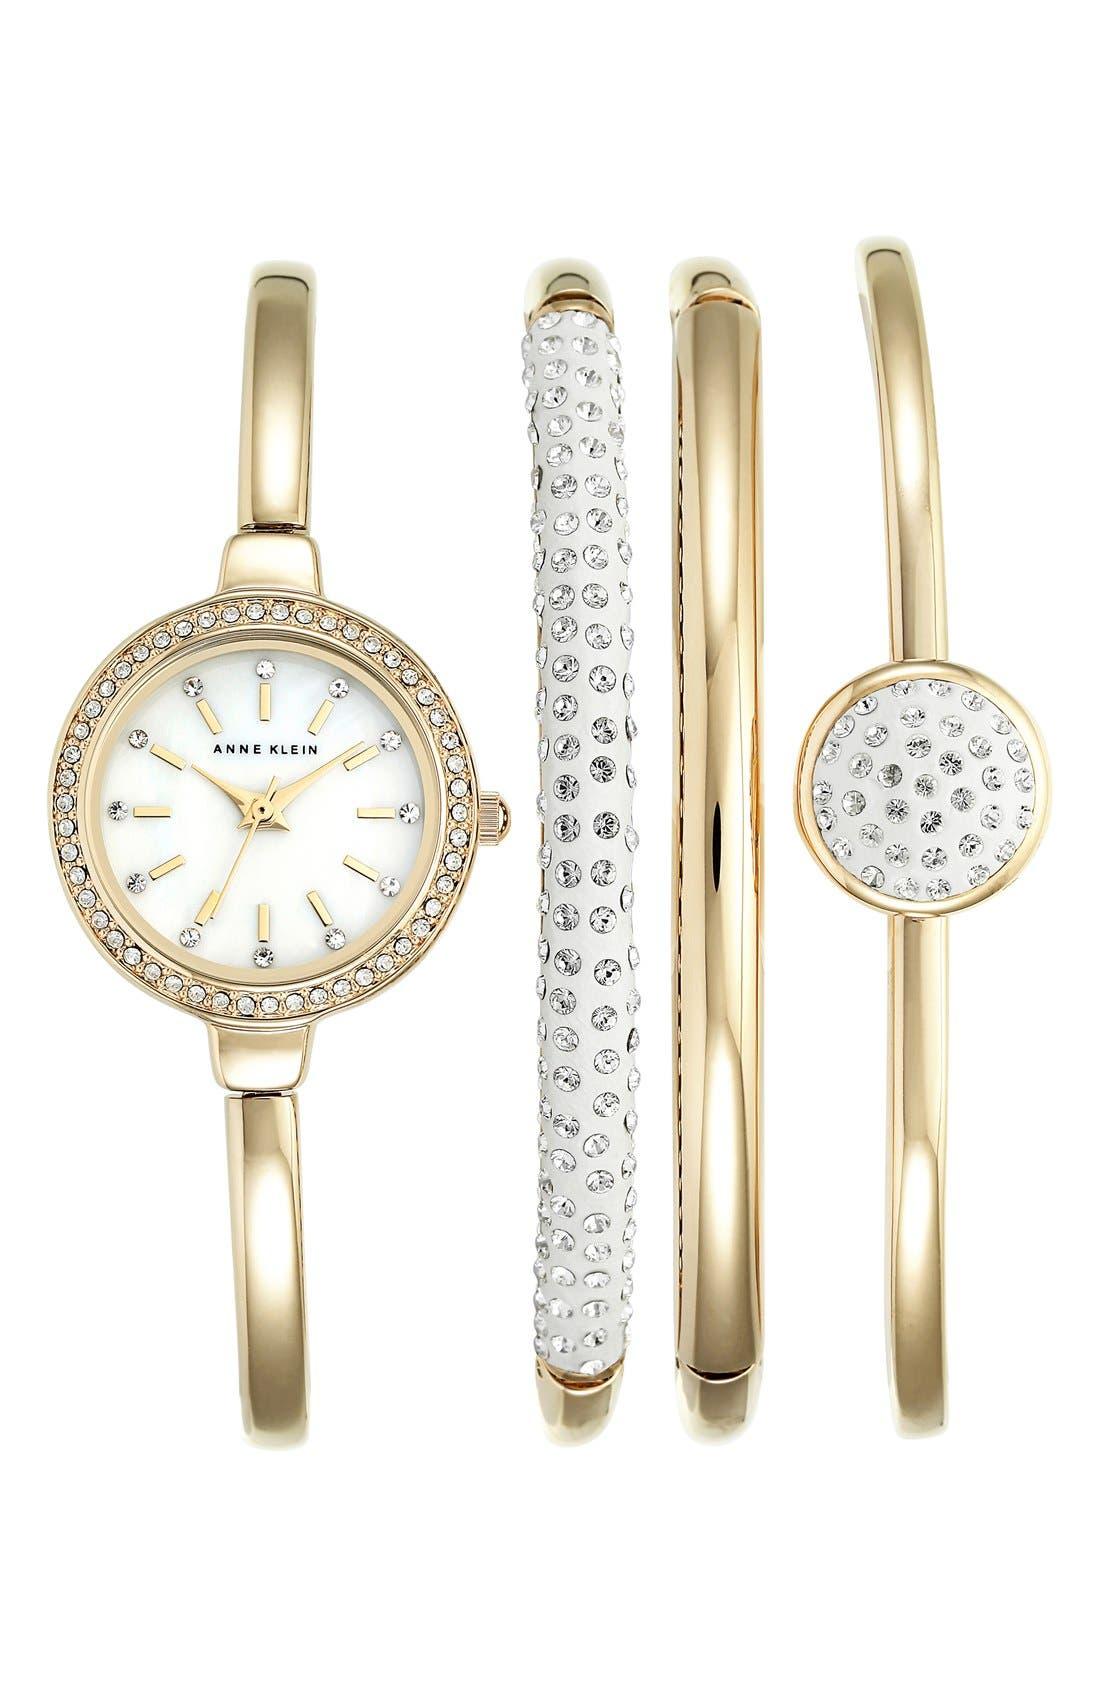 Main Image - Anne Klein Boxed Bracelet & Bangle Watch Set, 24mm